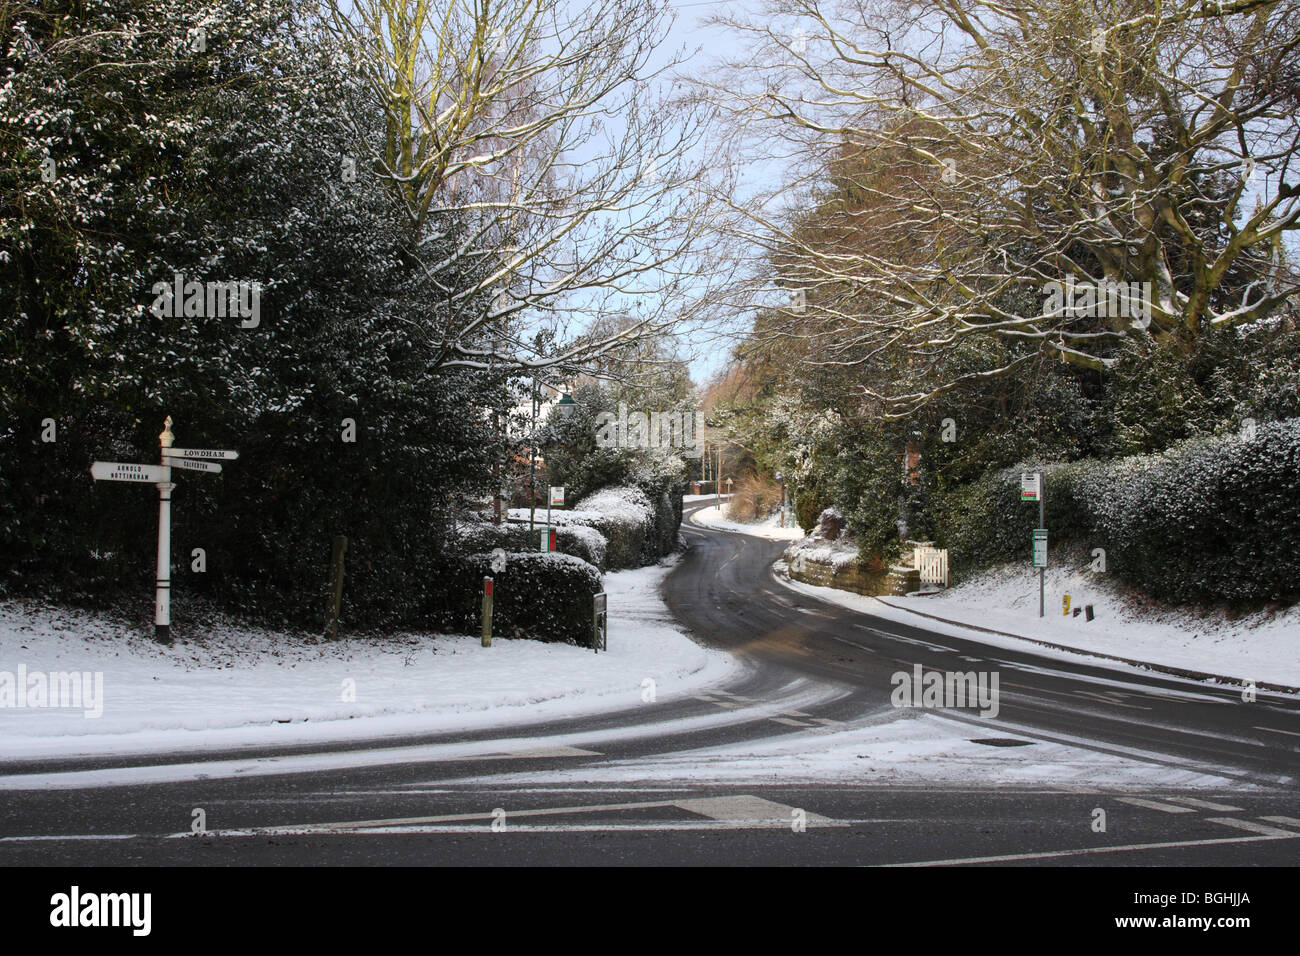 A road junction in winter. Woodborough, Nottinghamshire, England, U.K. - Stock Image